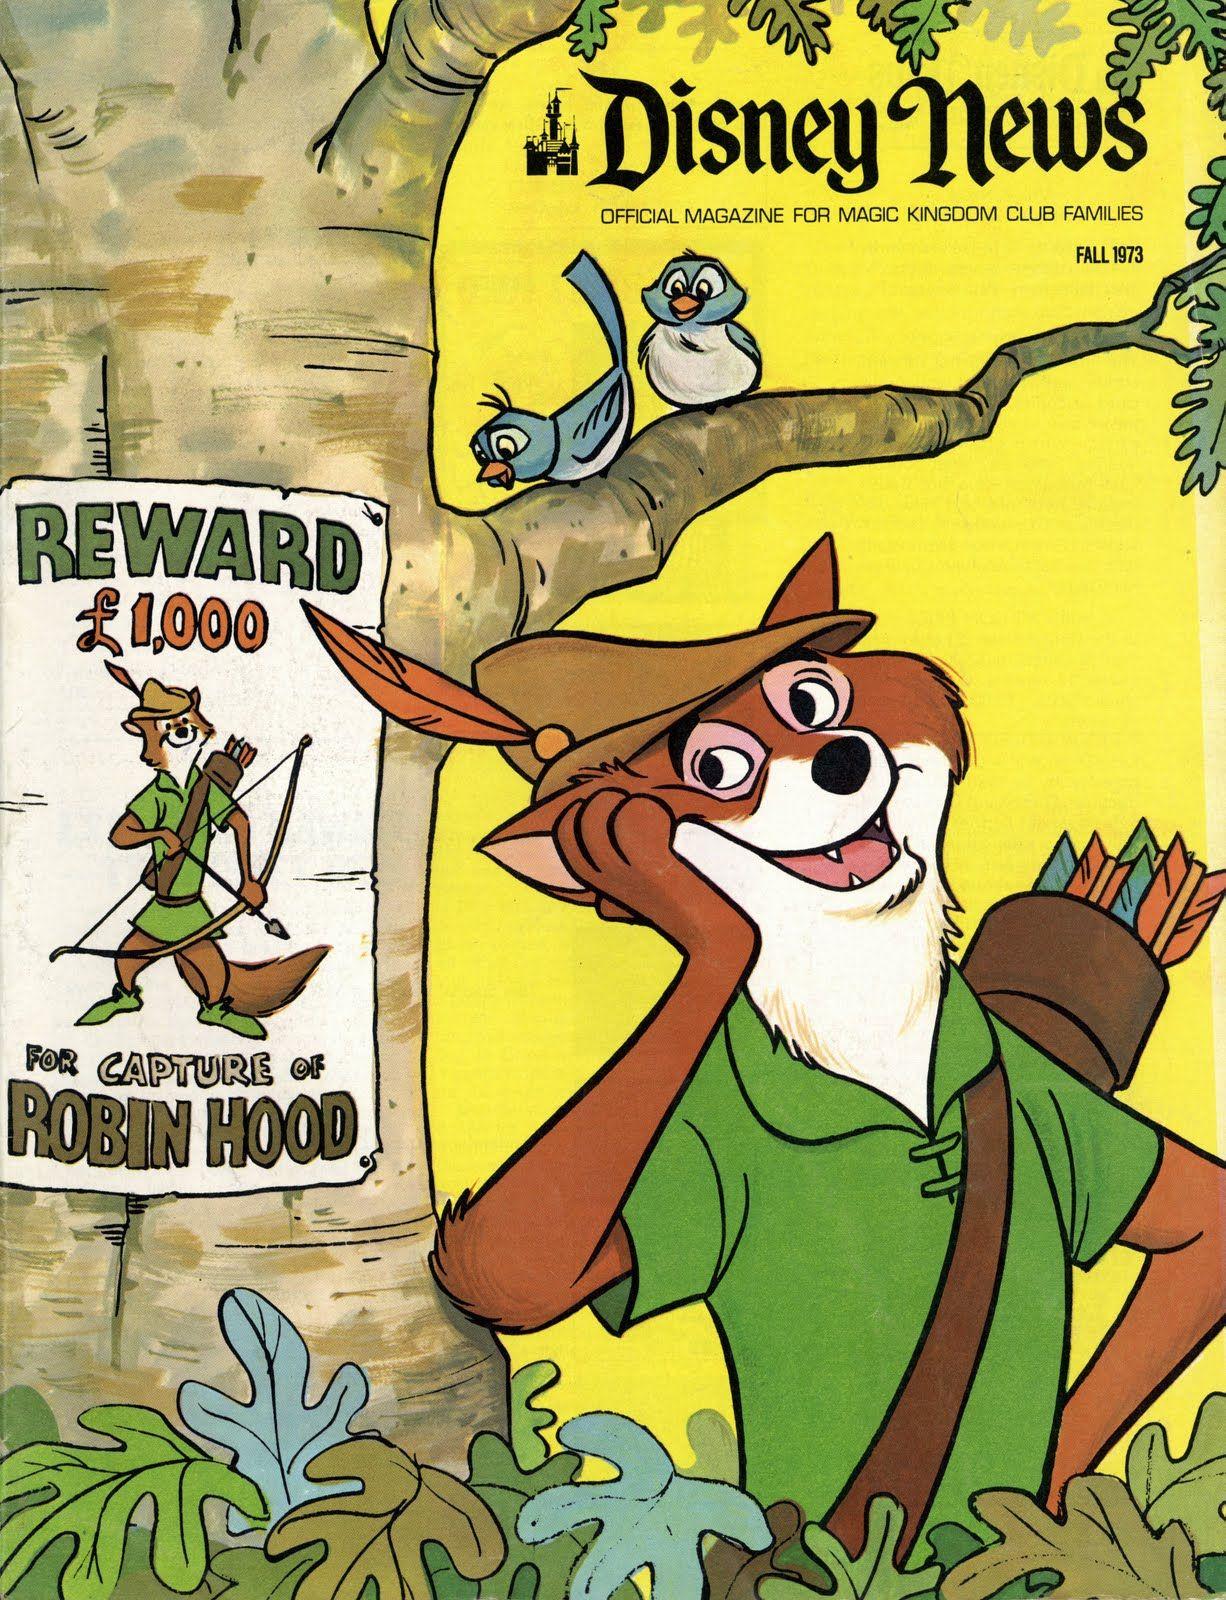 animationproclamations | Robin hood disney, Robin hood ...